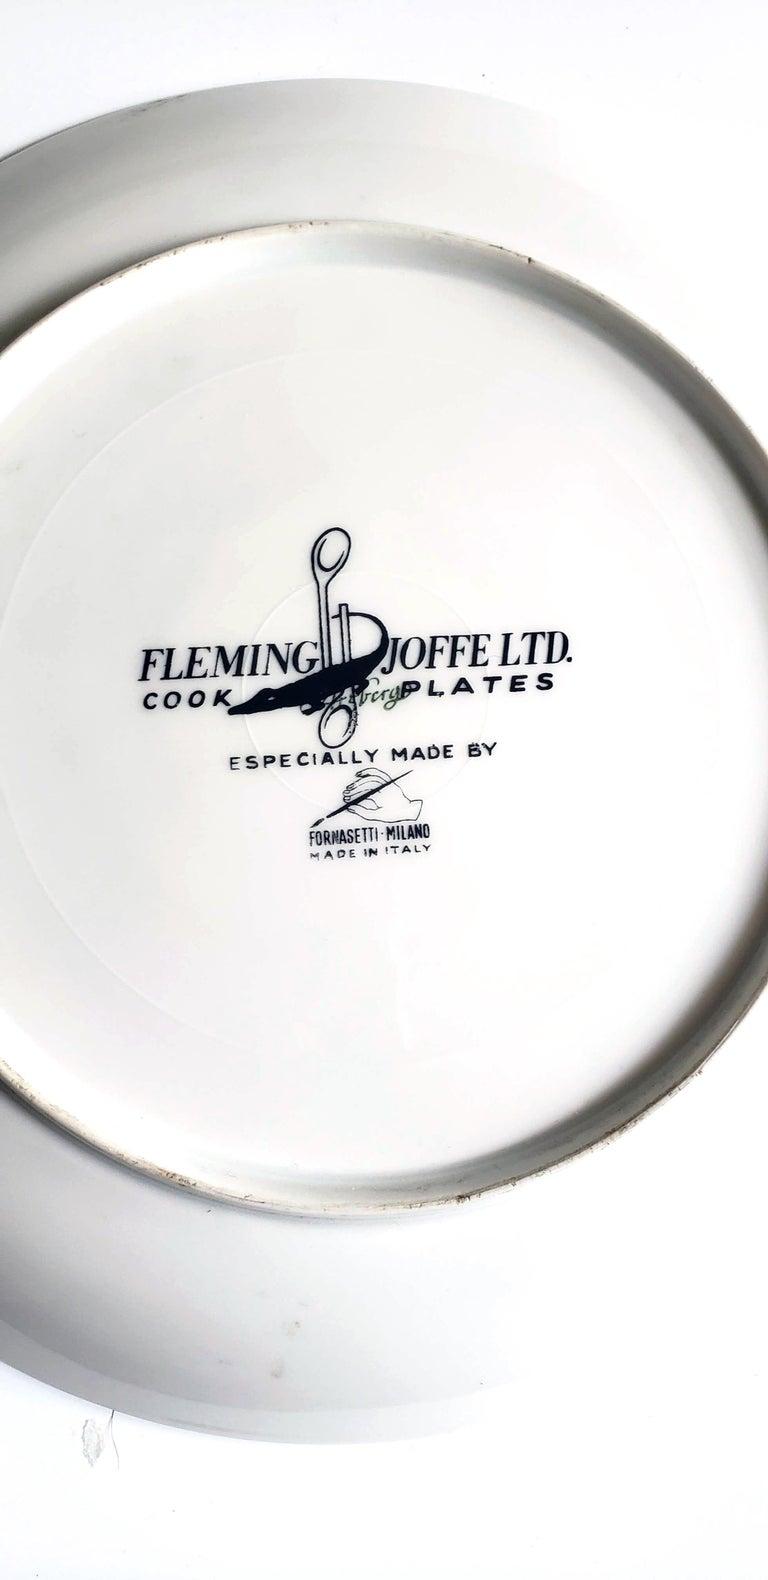 Mid-Century Modern Piero Fornasetti Fleming Joffe Porcelain Recipe Plate, Snake a la Cleopatra For Sale